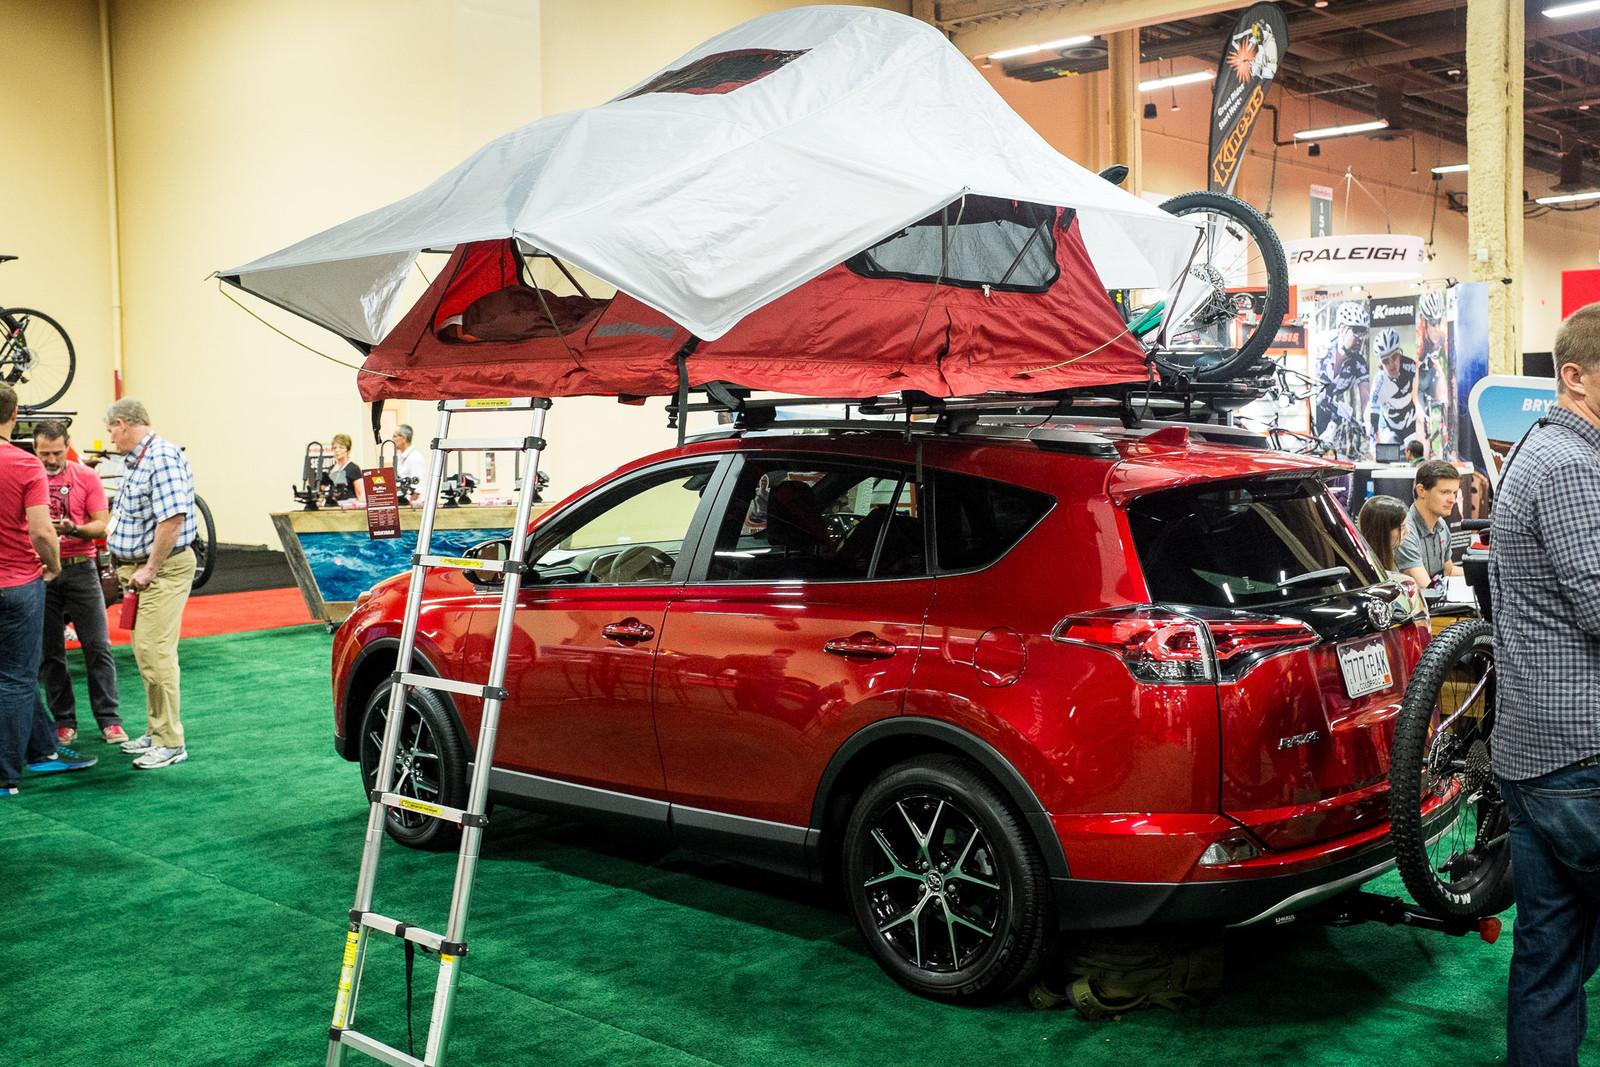 Yakima SkyRise Roof Mounted Tent - INTERBIKE - 2017 Mountain Bike Components - Mountain Biking Pictures - Vital MTB